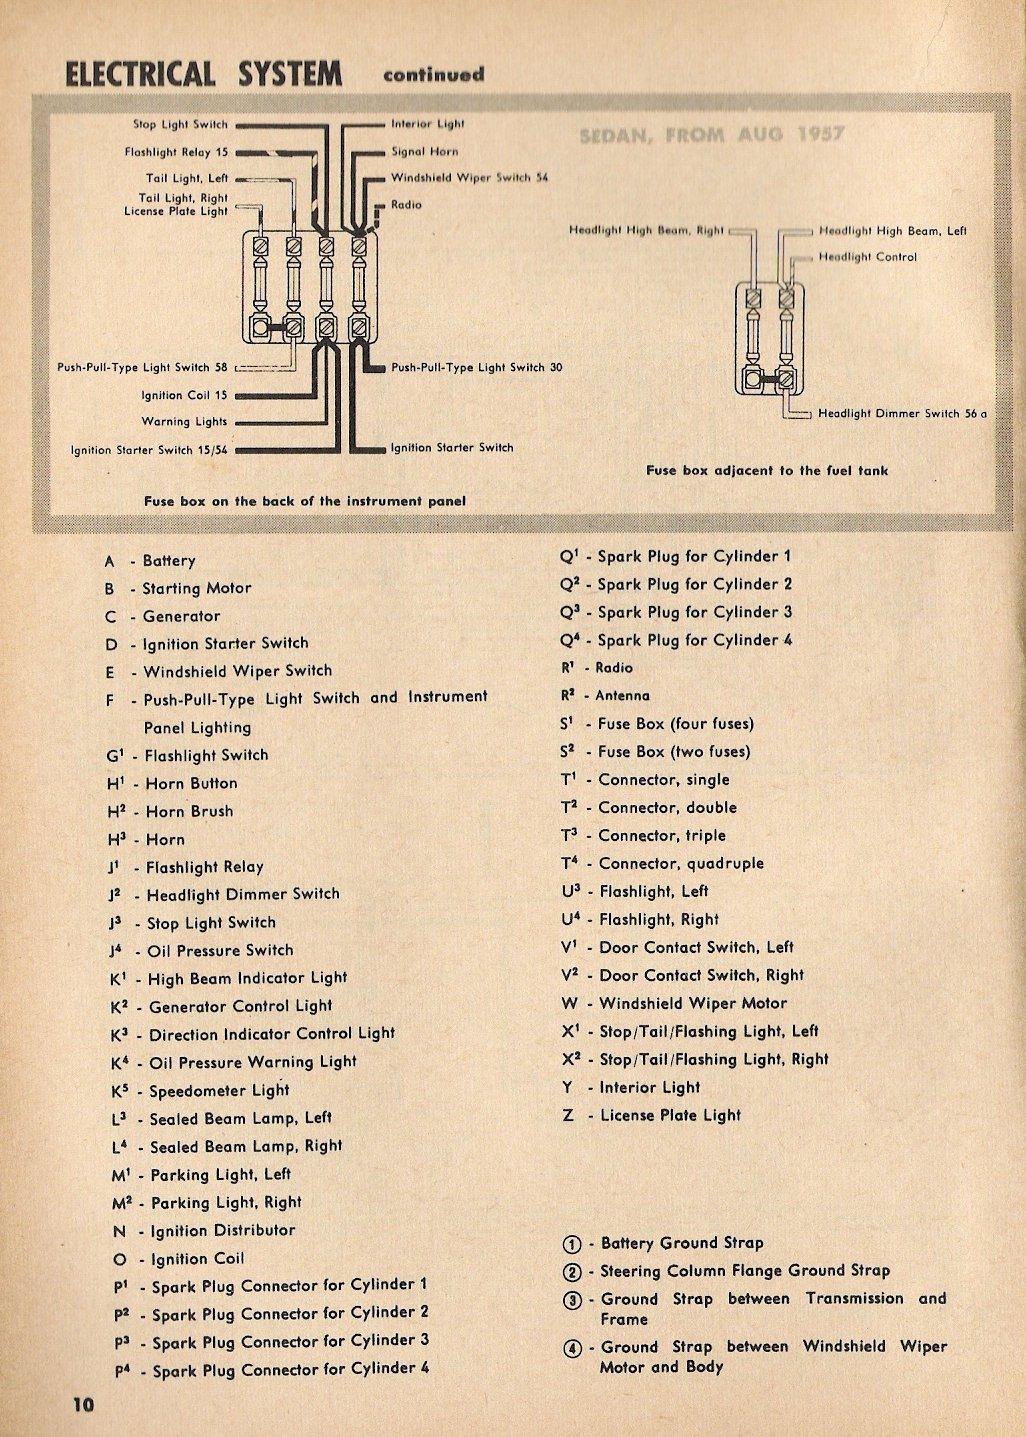 1971 Volkswagen Beetle Wiring Diagram 1957 Beetle Wiring Diagram Thegoldenbug Com